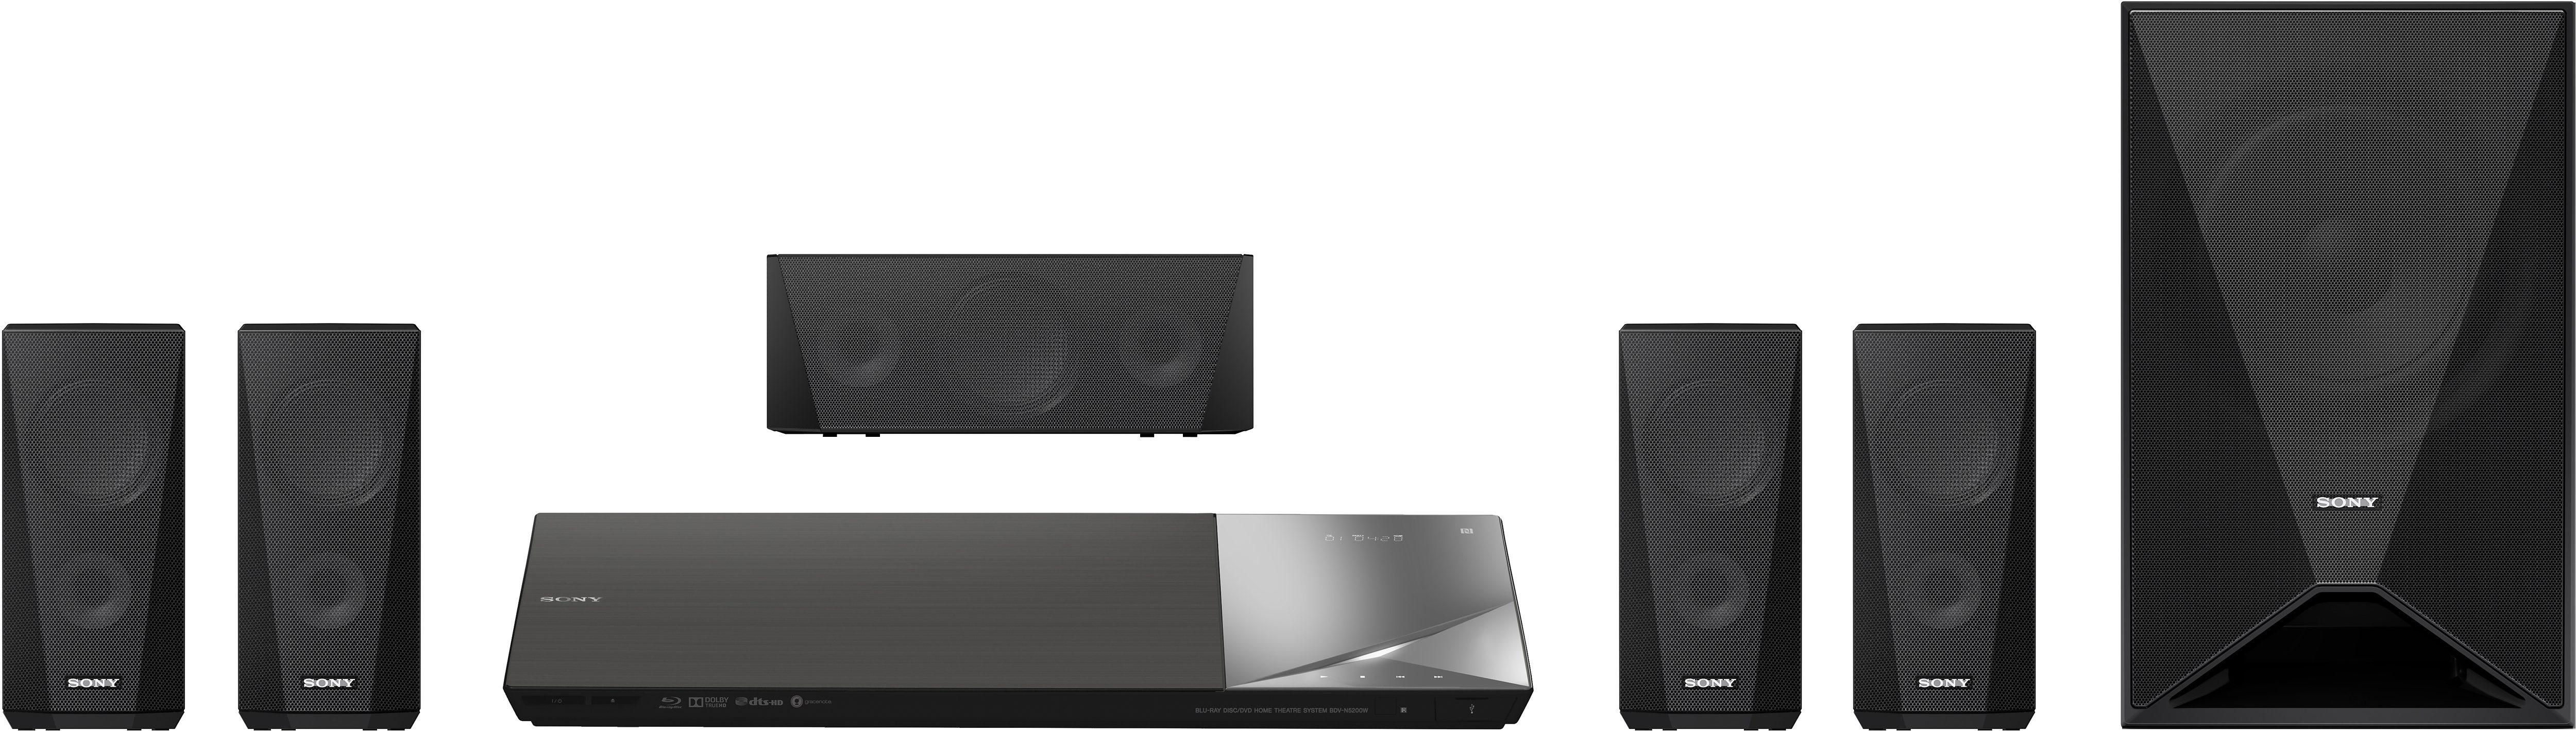 Sony BDV-N5200W Blu-ray Heimkinosystem, 3D